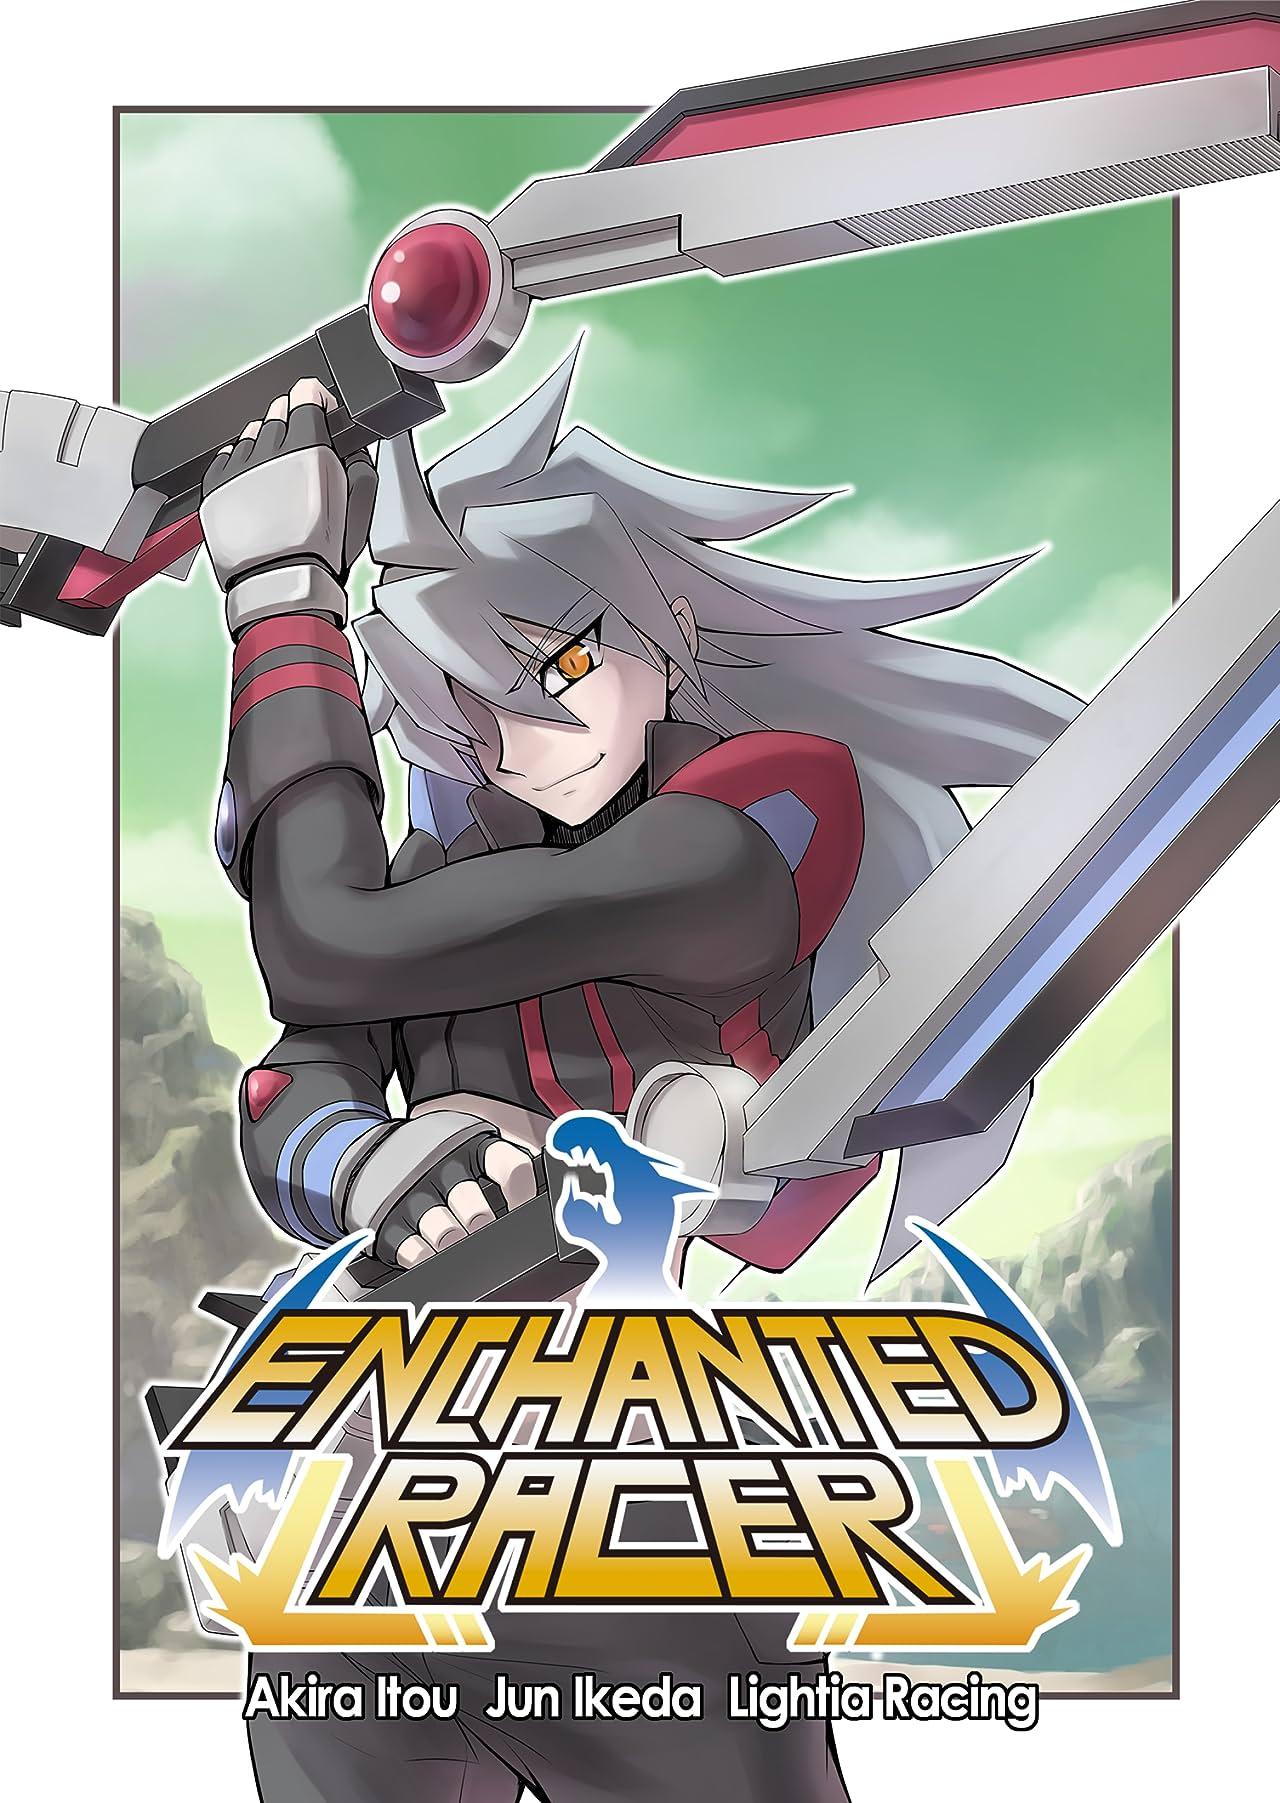 Enchanted Racer Vol. 1 #6